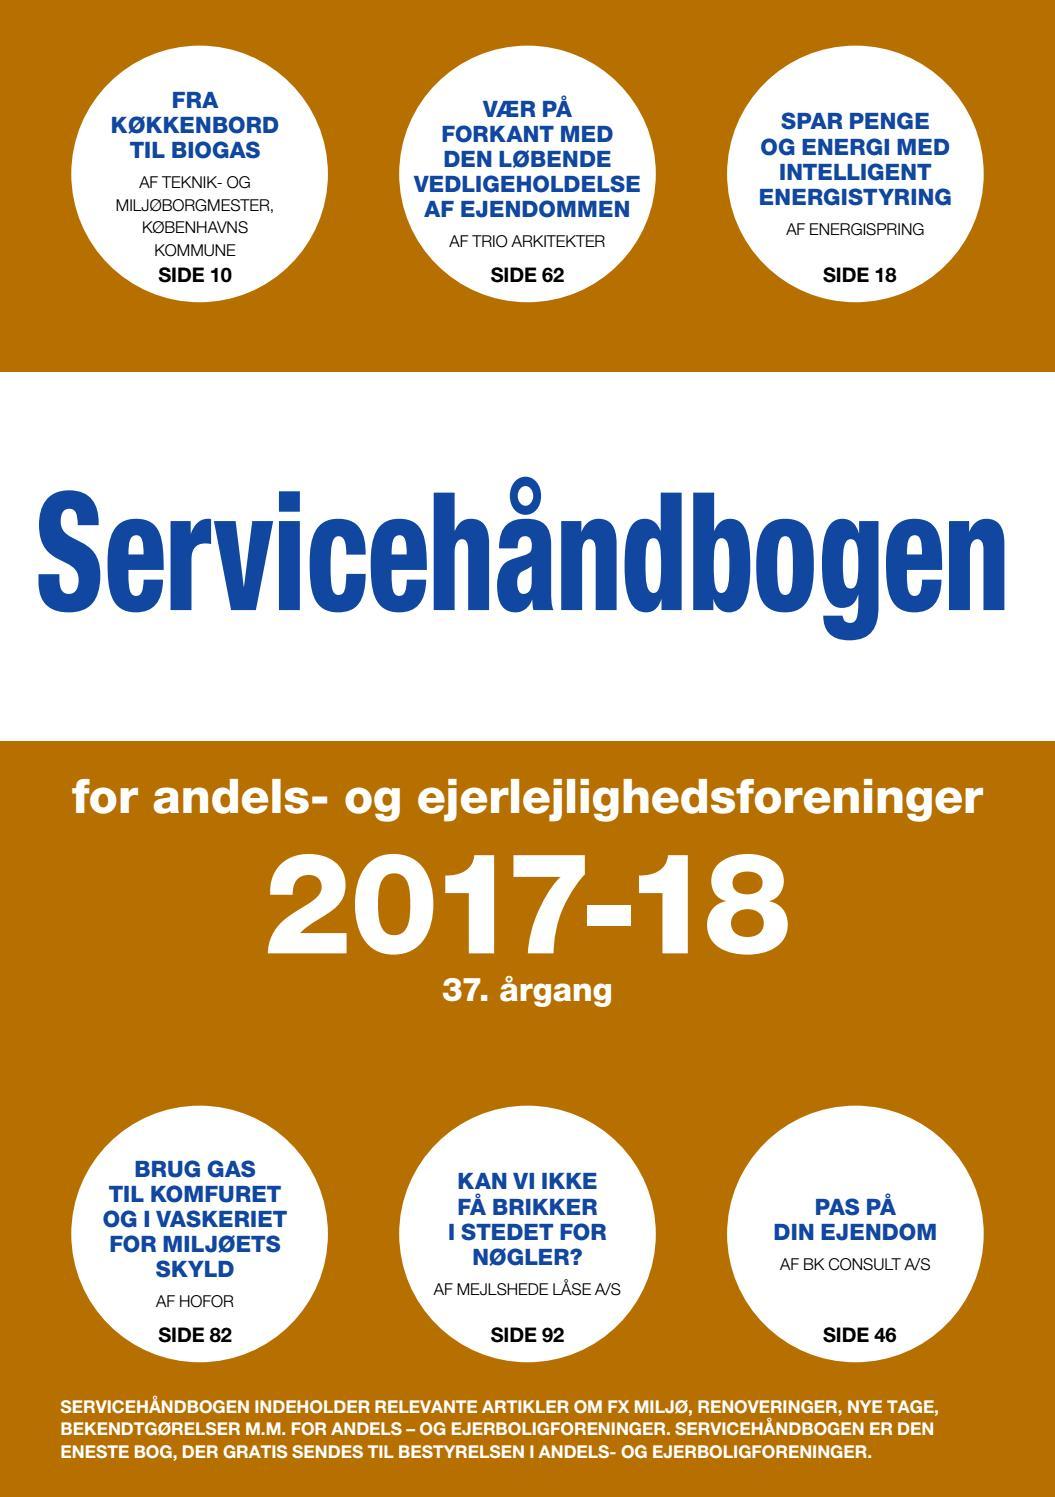 d98b1be117f Servicehåndbogen 2017-18 by Min Boligforening - issuu